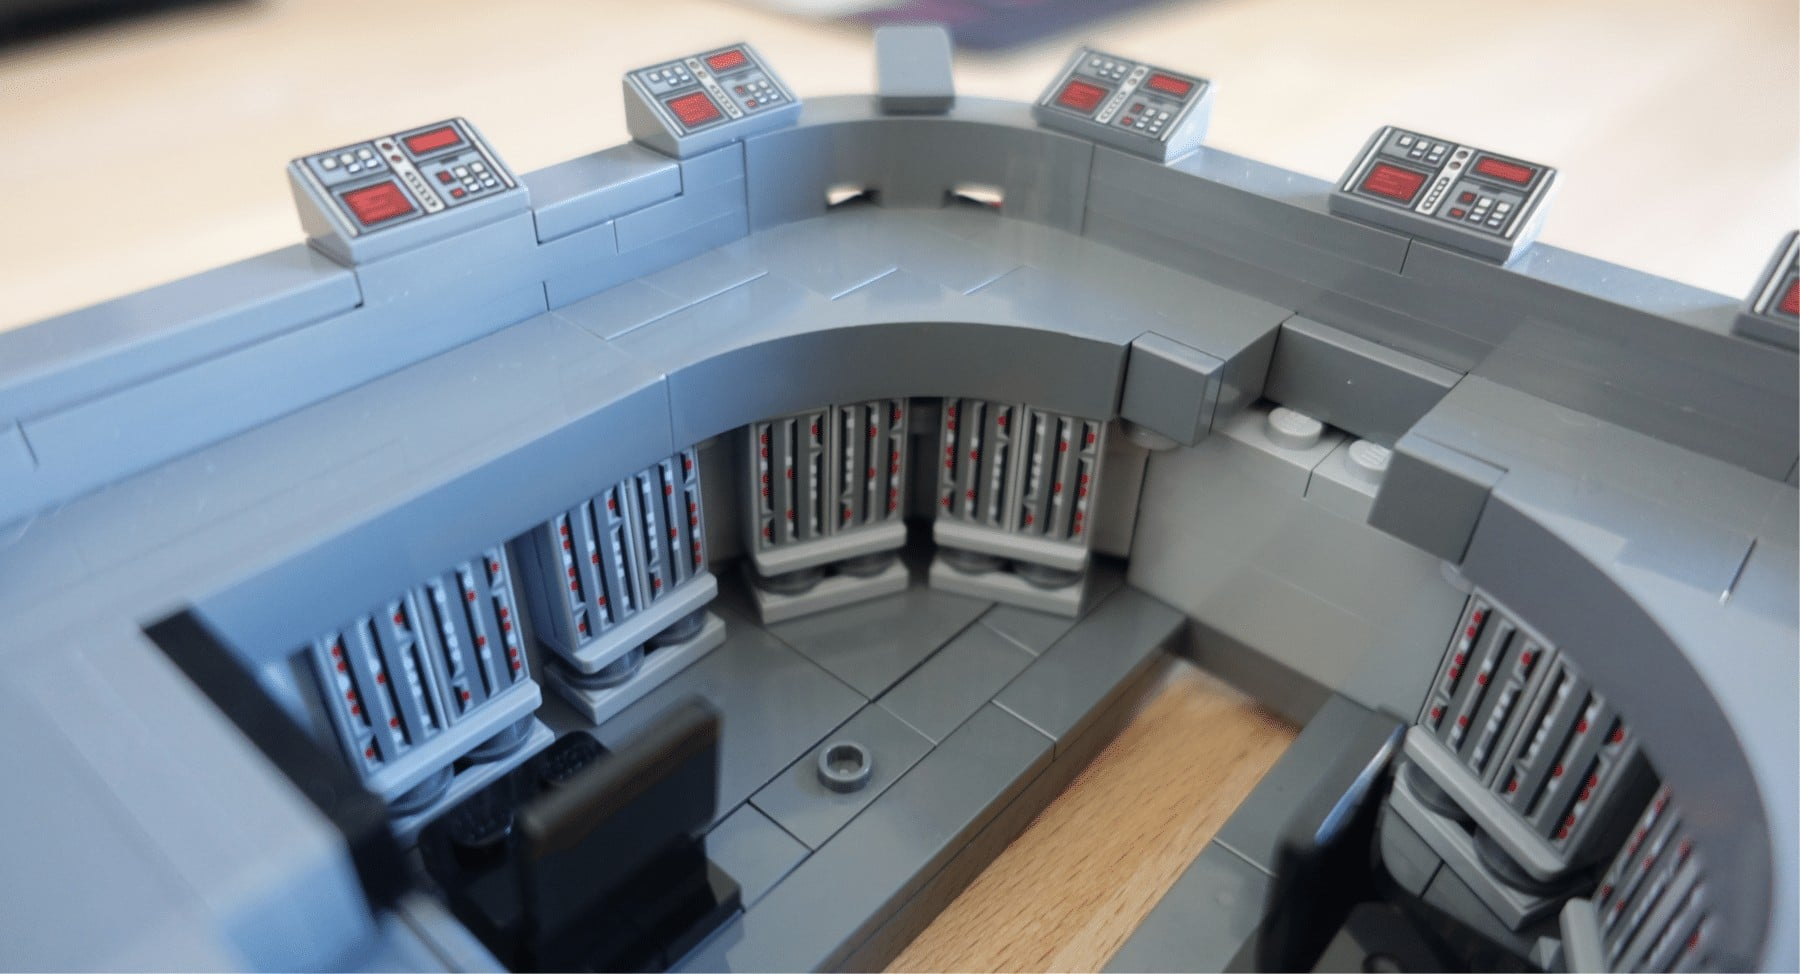 Brückenraum des Imperial Star Destroyers